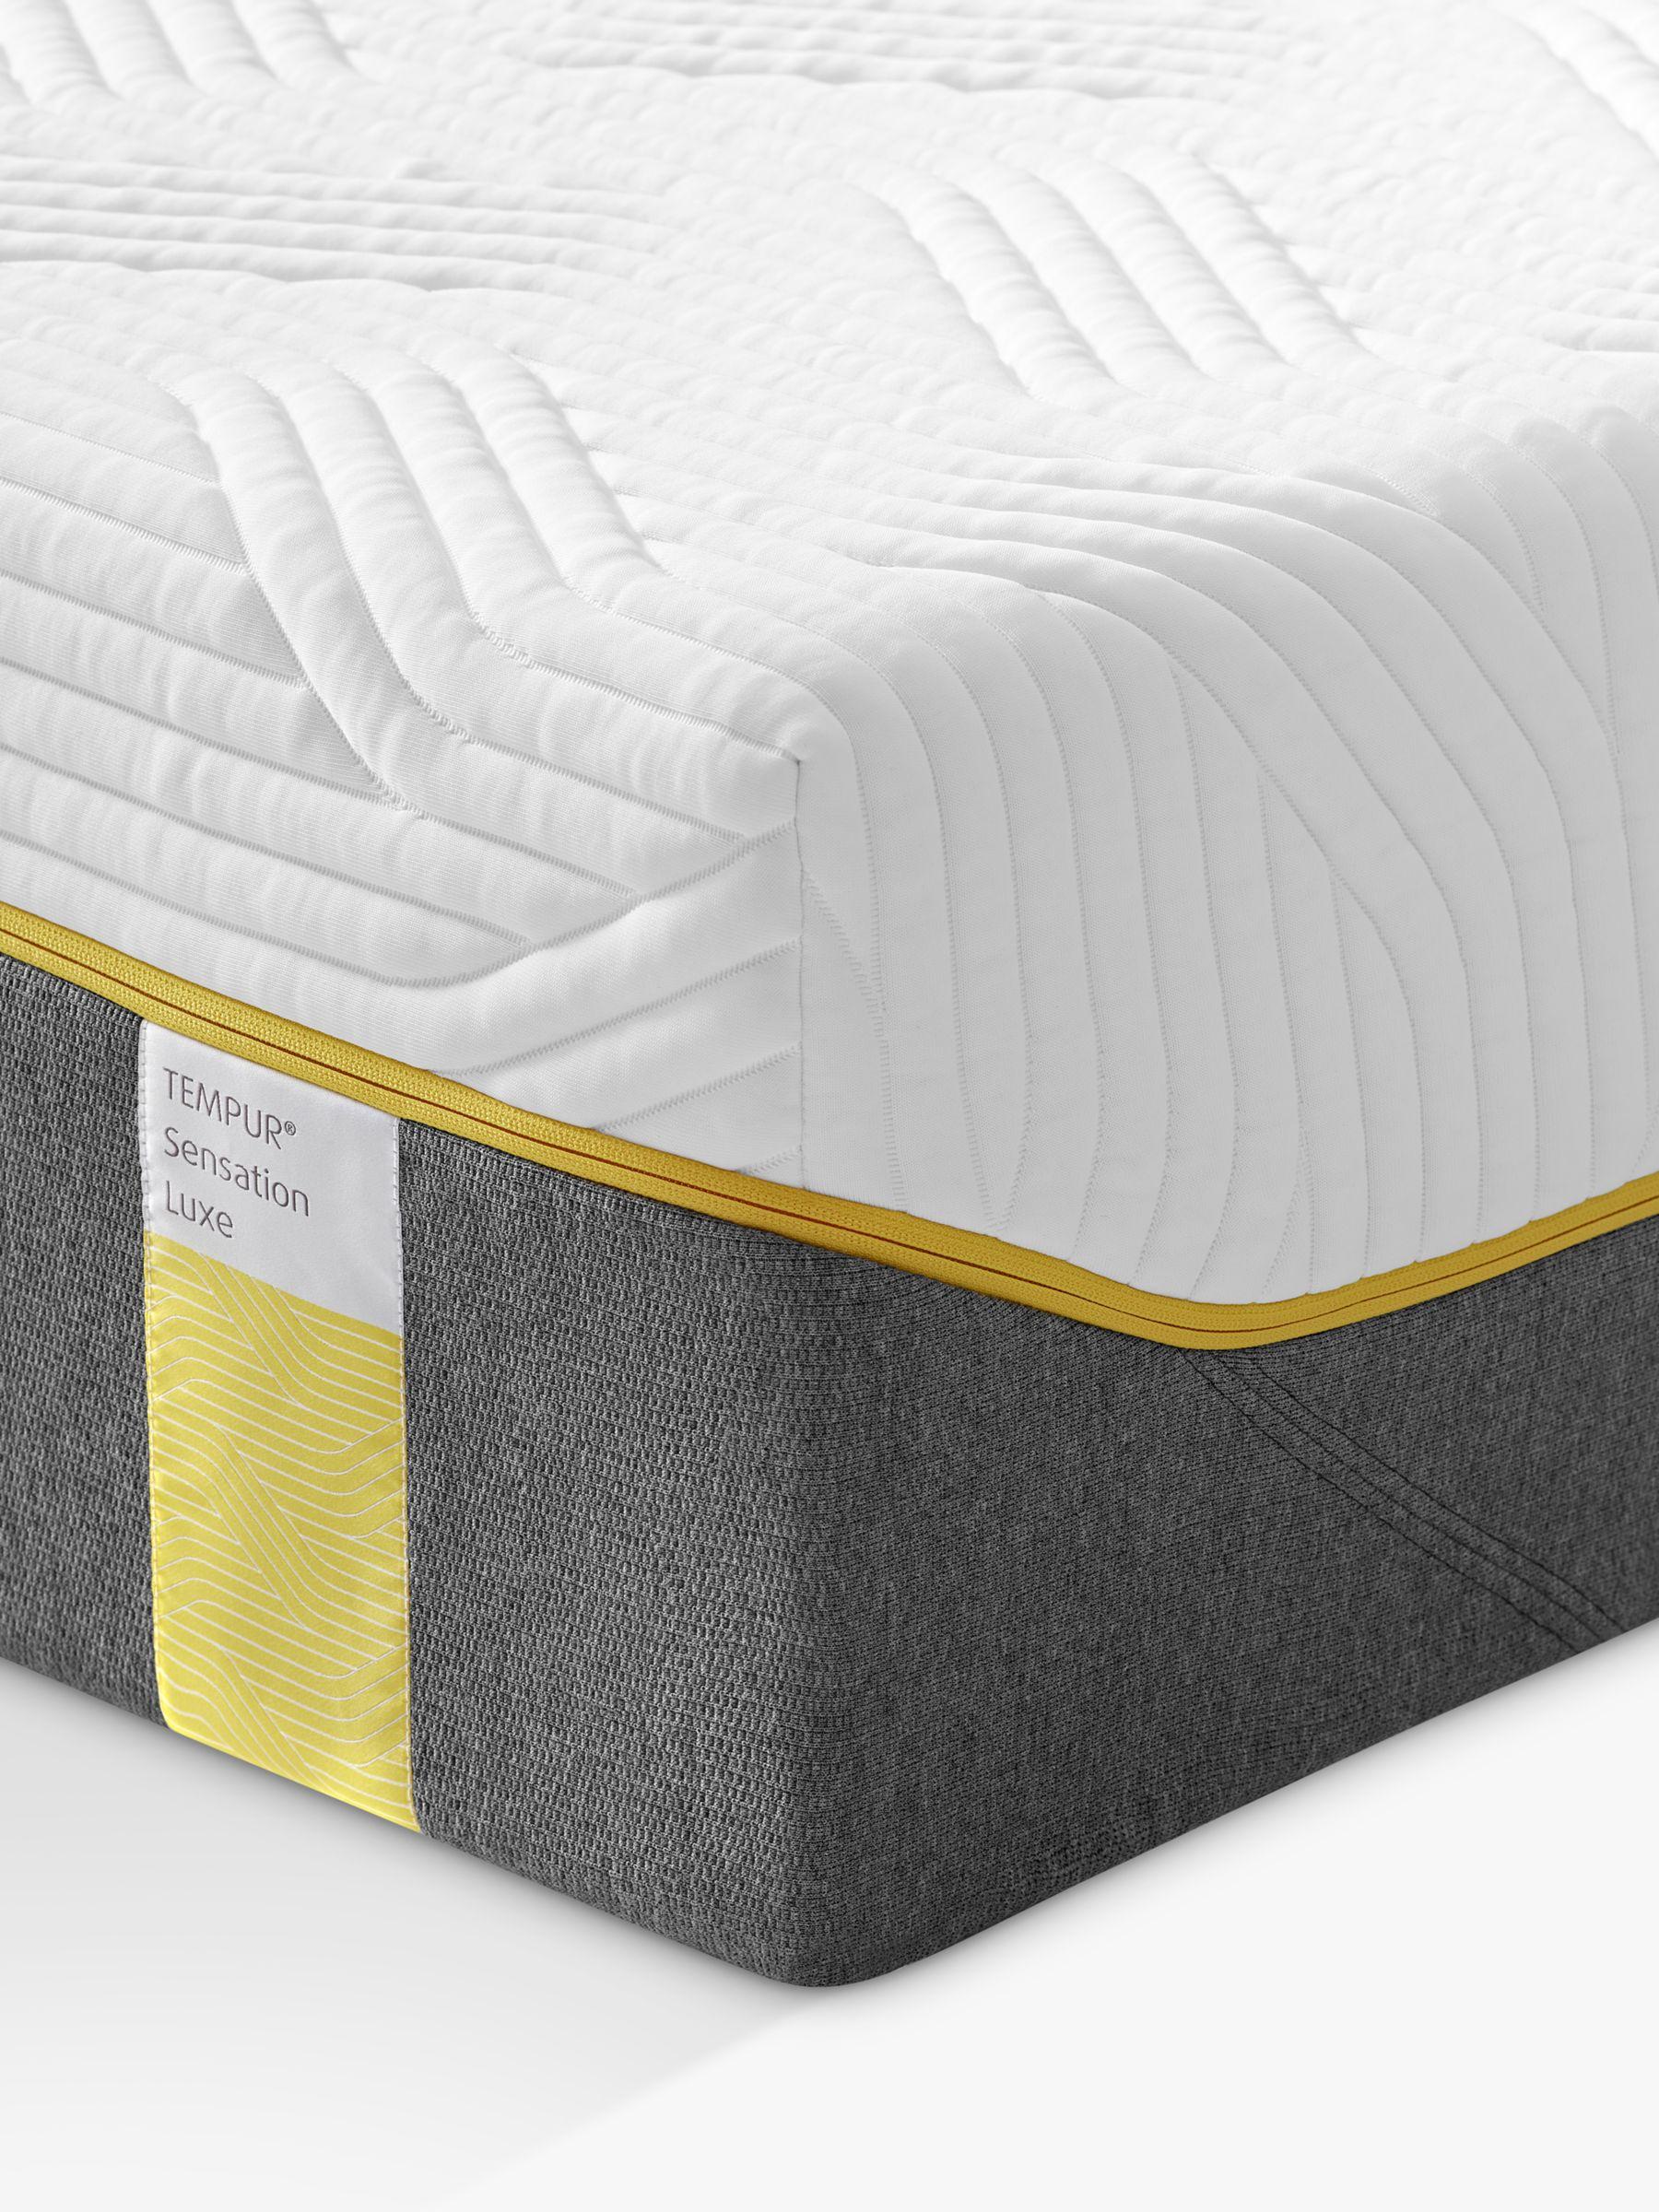 Tempur Tempur Sensation Luxe 30 Memory Foam Mattress, Medium, Double